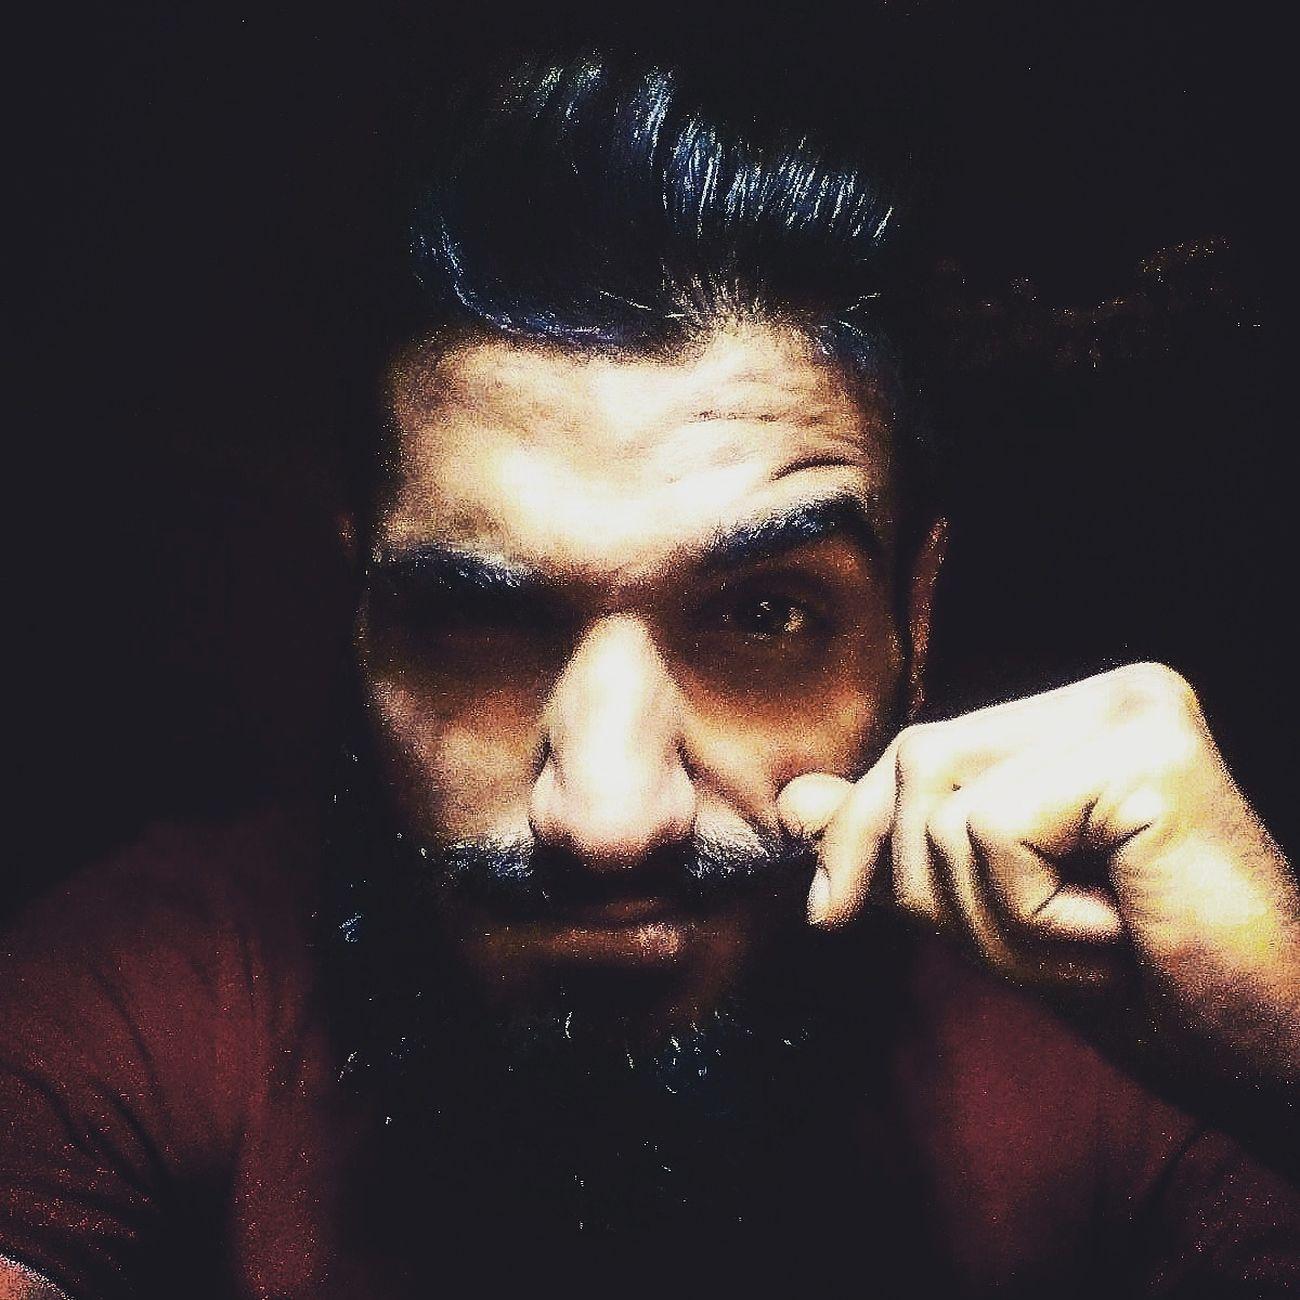 Beard Gang Djlife Stoner Fearless Gamerguy Tomorrowpeople First Eyeem Photo